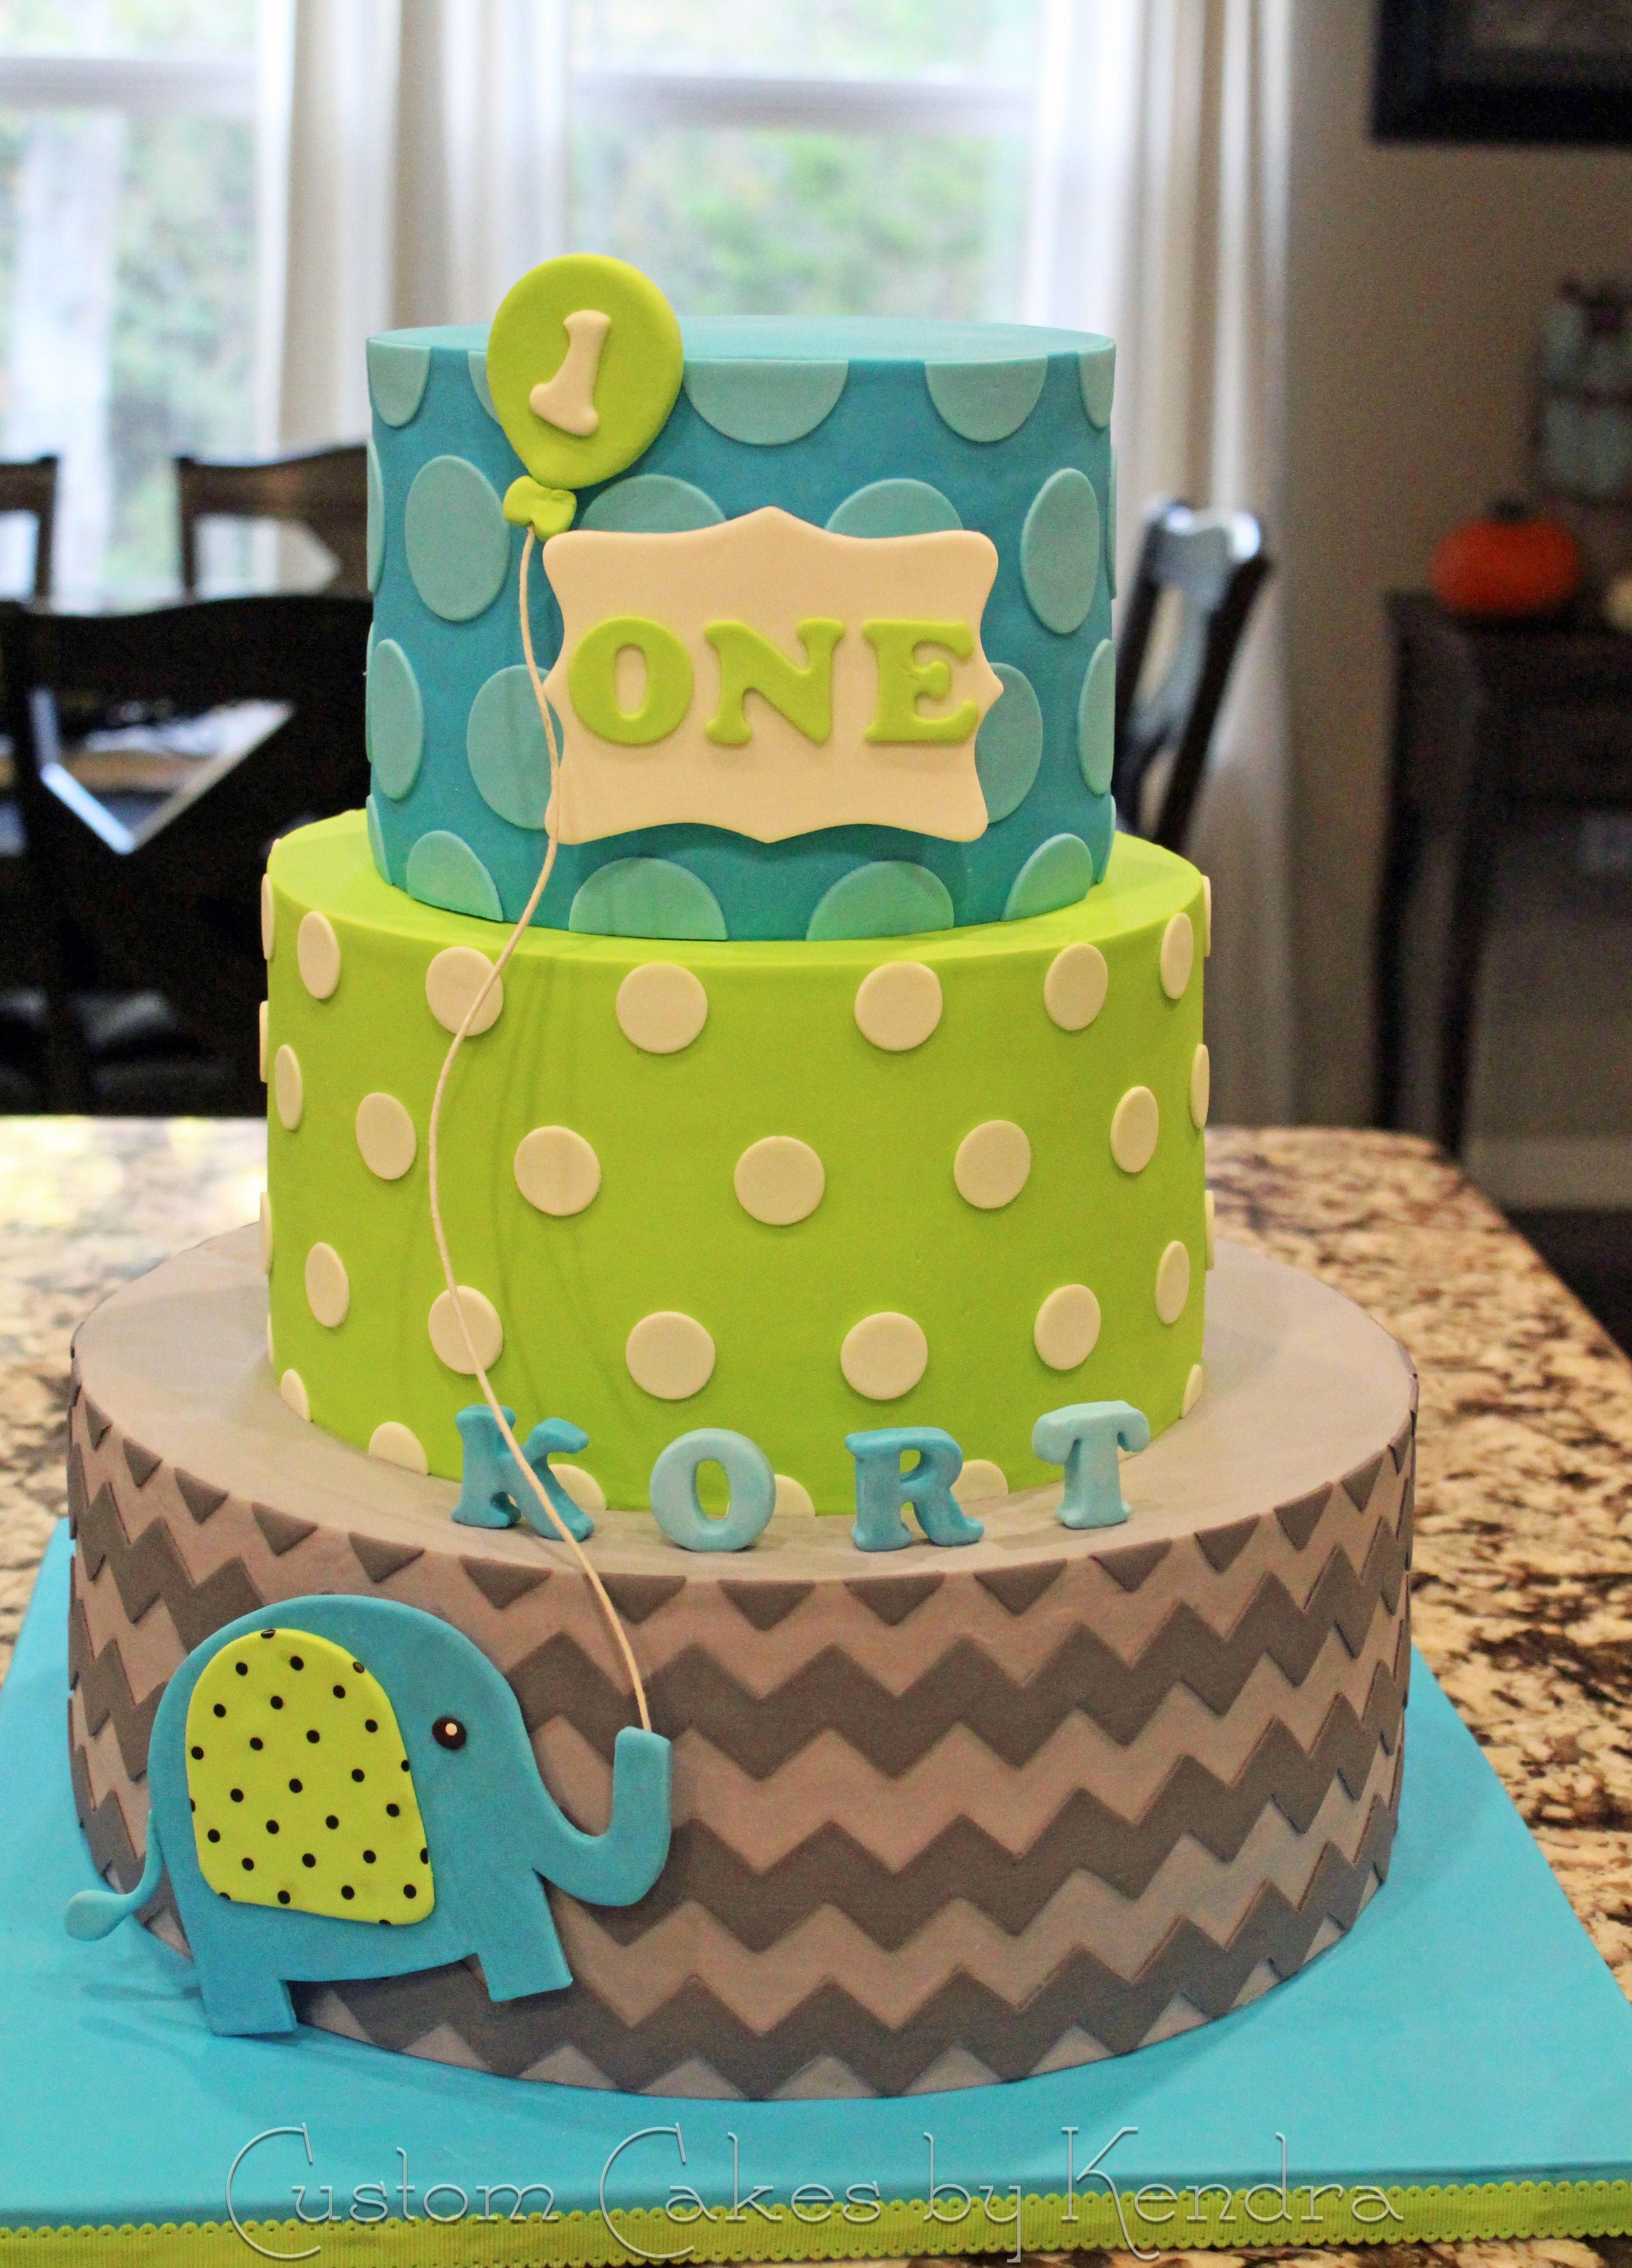 KORT'S FIRST BIRTHDAY Miracle baby's first birthday cake